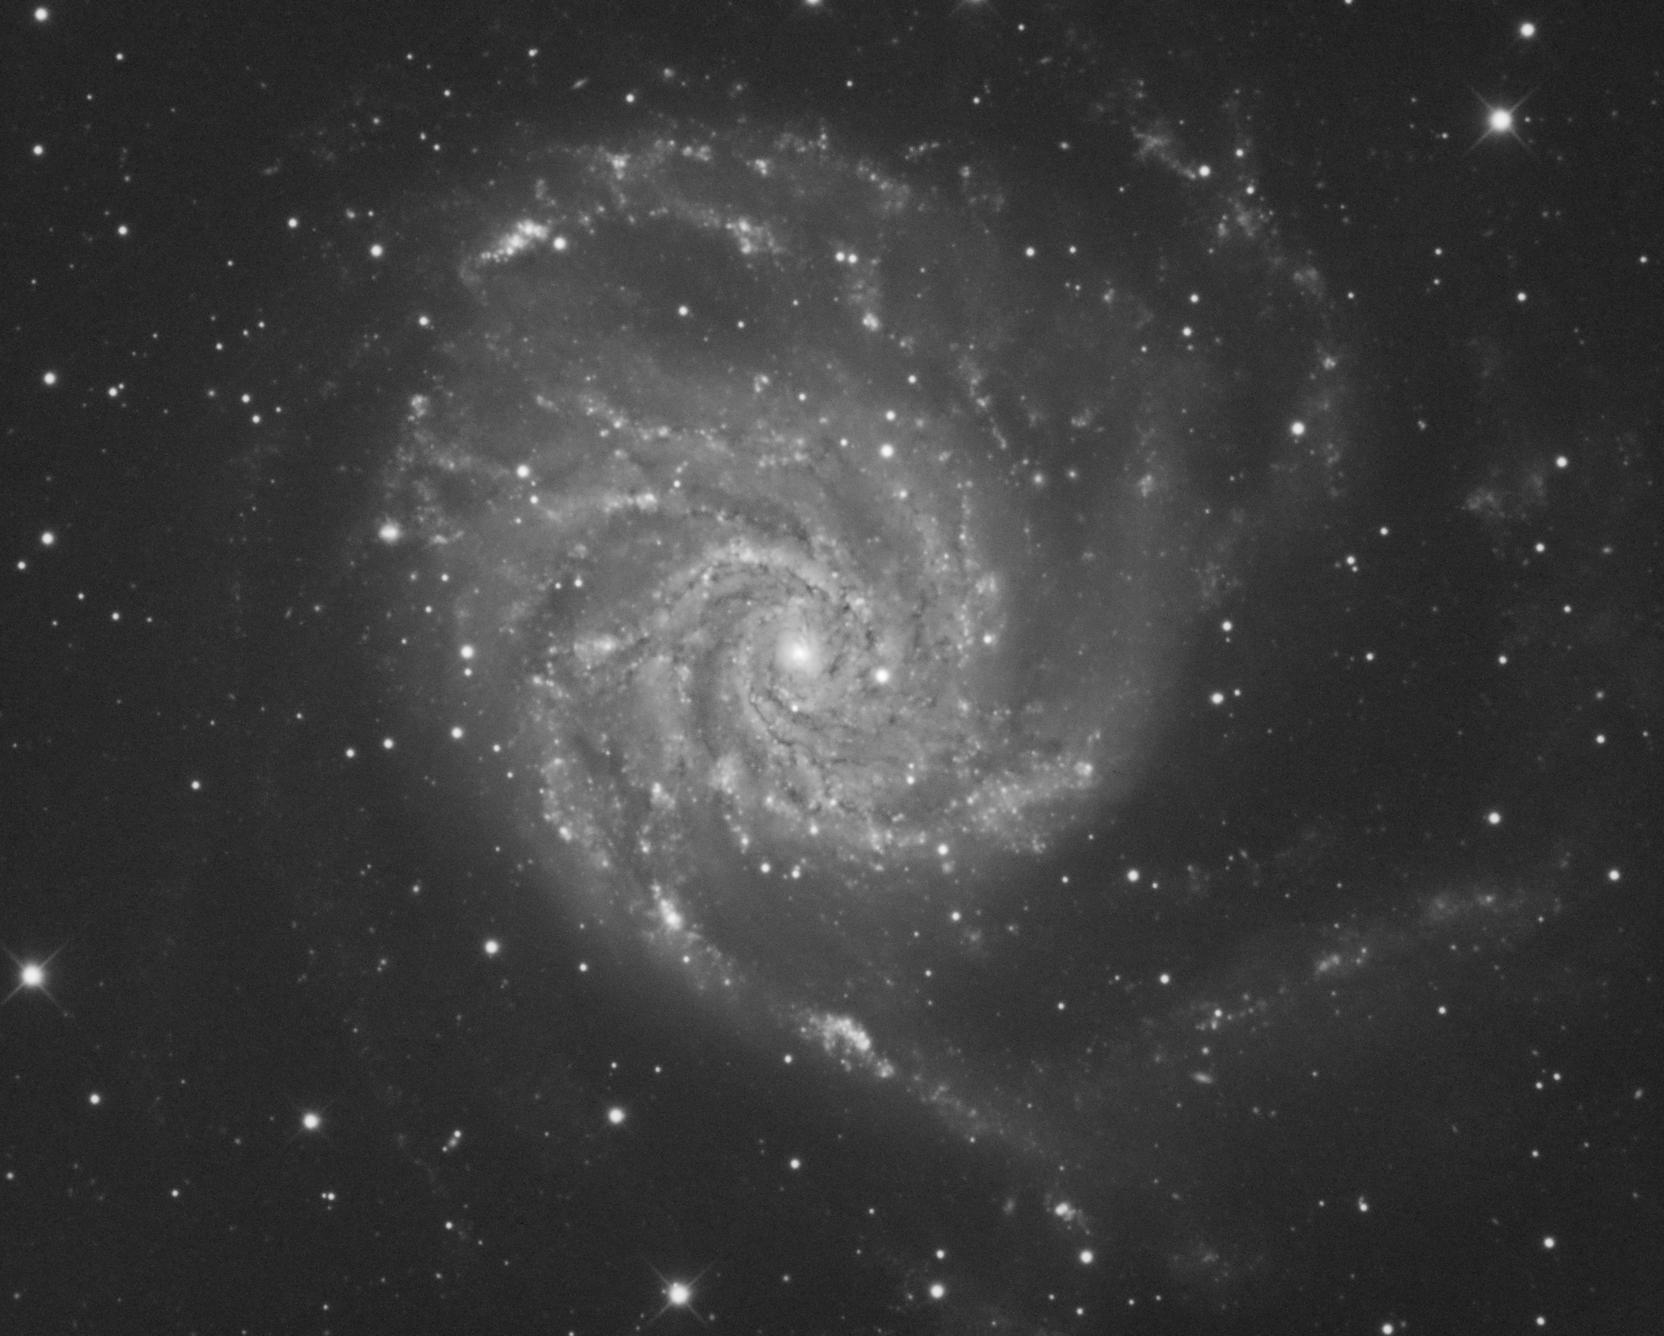 L_M101_v2.png.e0c04ac18f6351a22d4d83eb0ddec72a.png